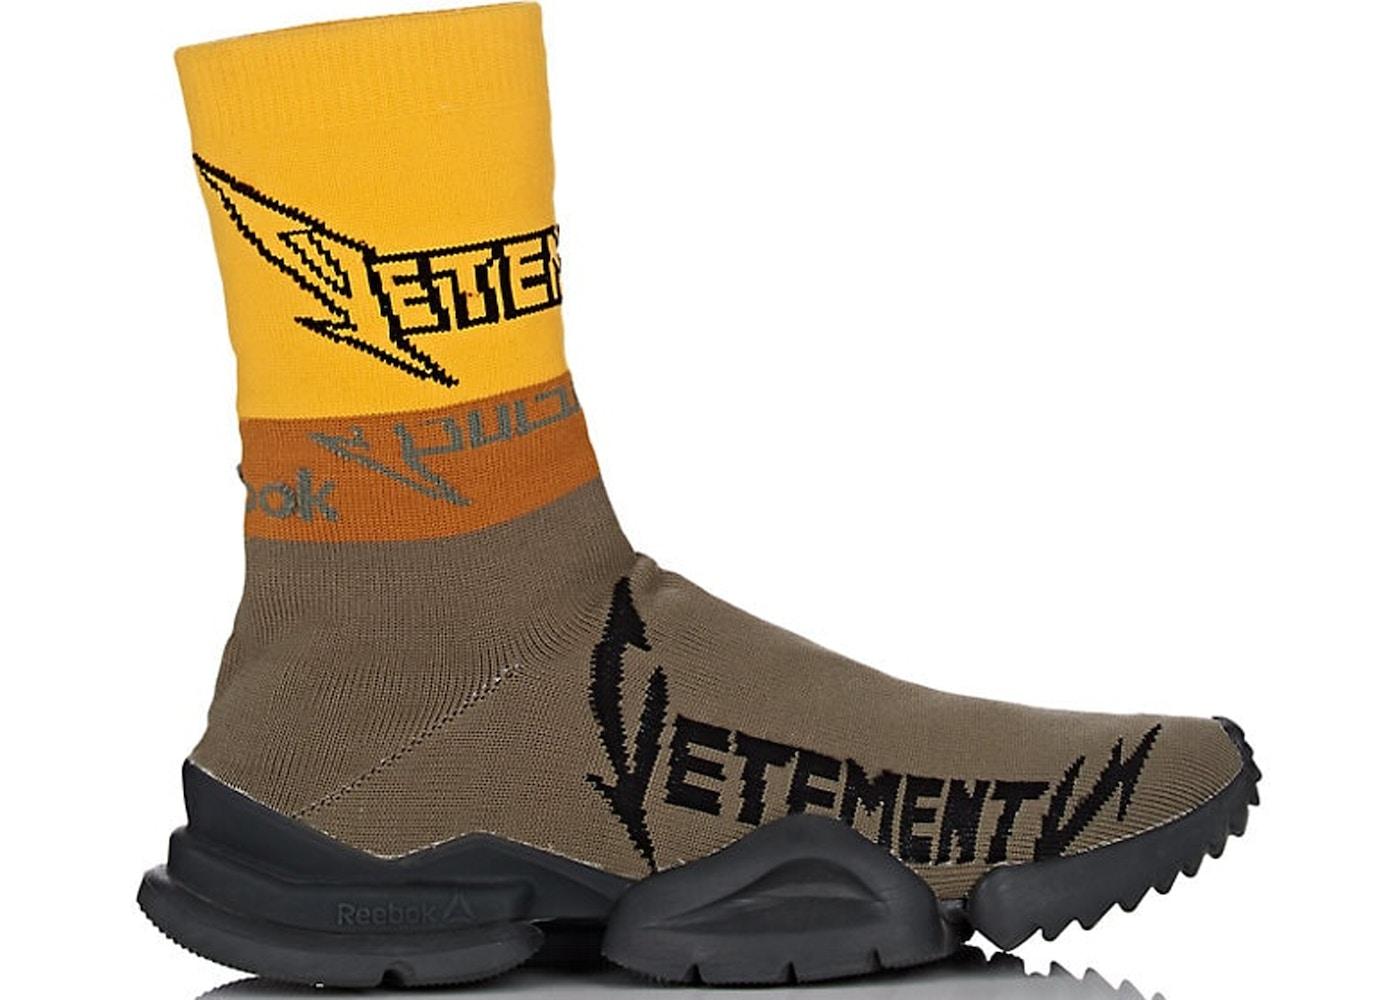 999308cd06e8 Reebok Sock Runner Vetements Olive Yellow Black - TBA